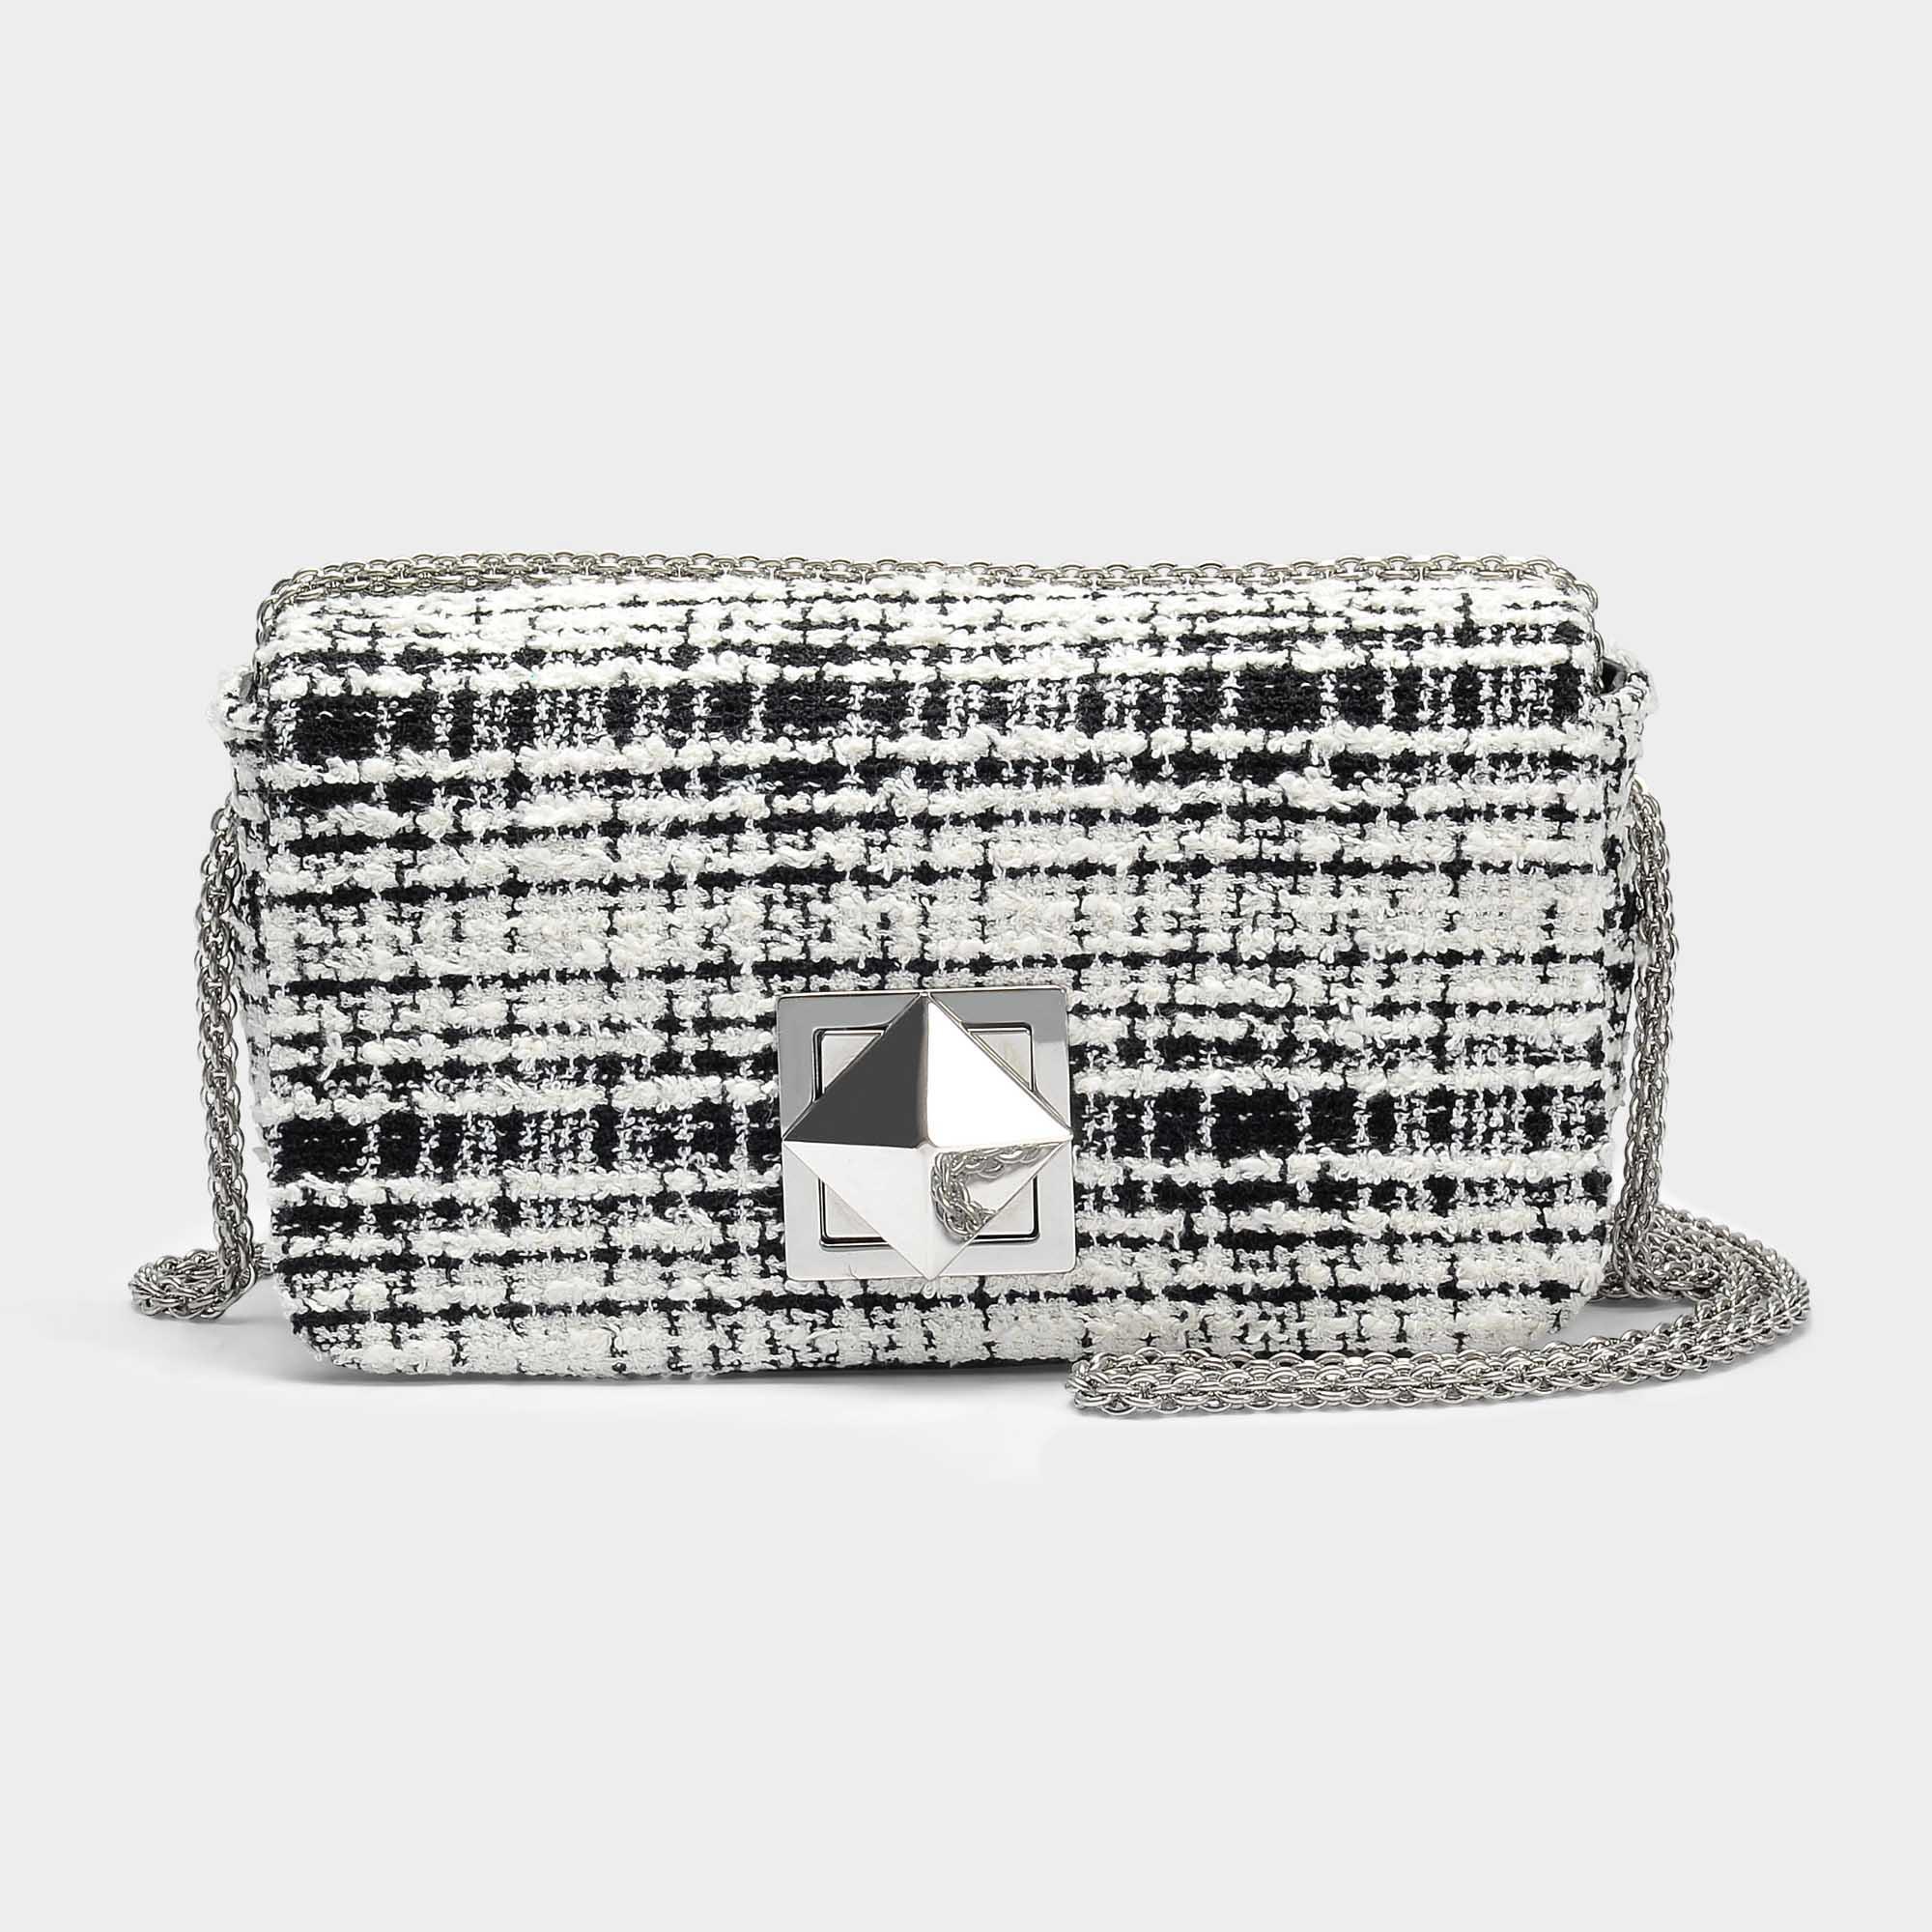 Sonia Rykiel Le Copain Sac Moyen En Tweed Noir Et Blanc DMVaFe